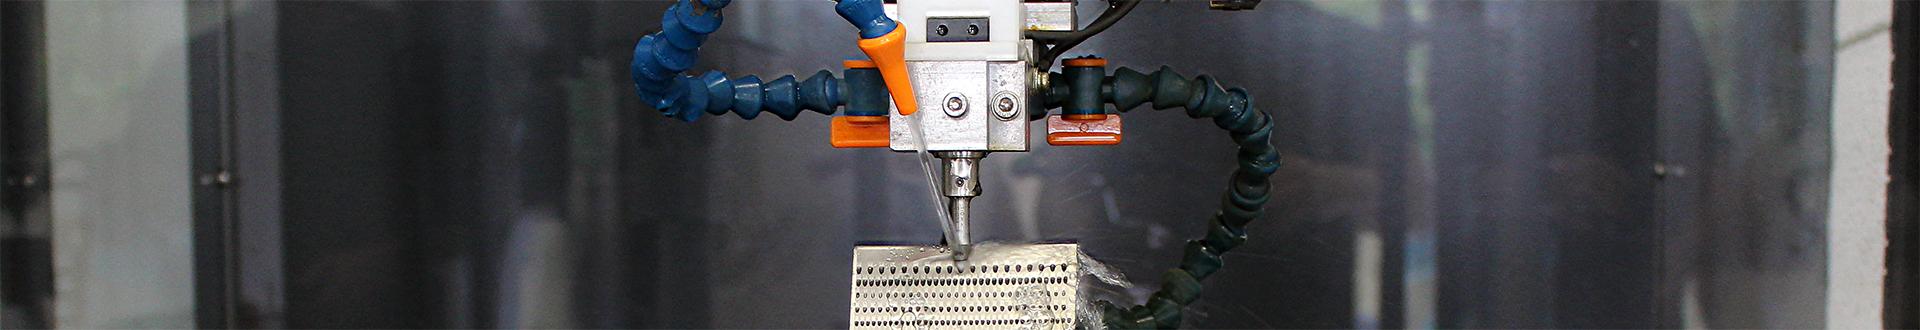 edm hole drilling